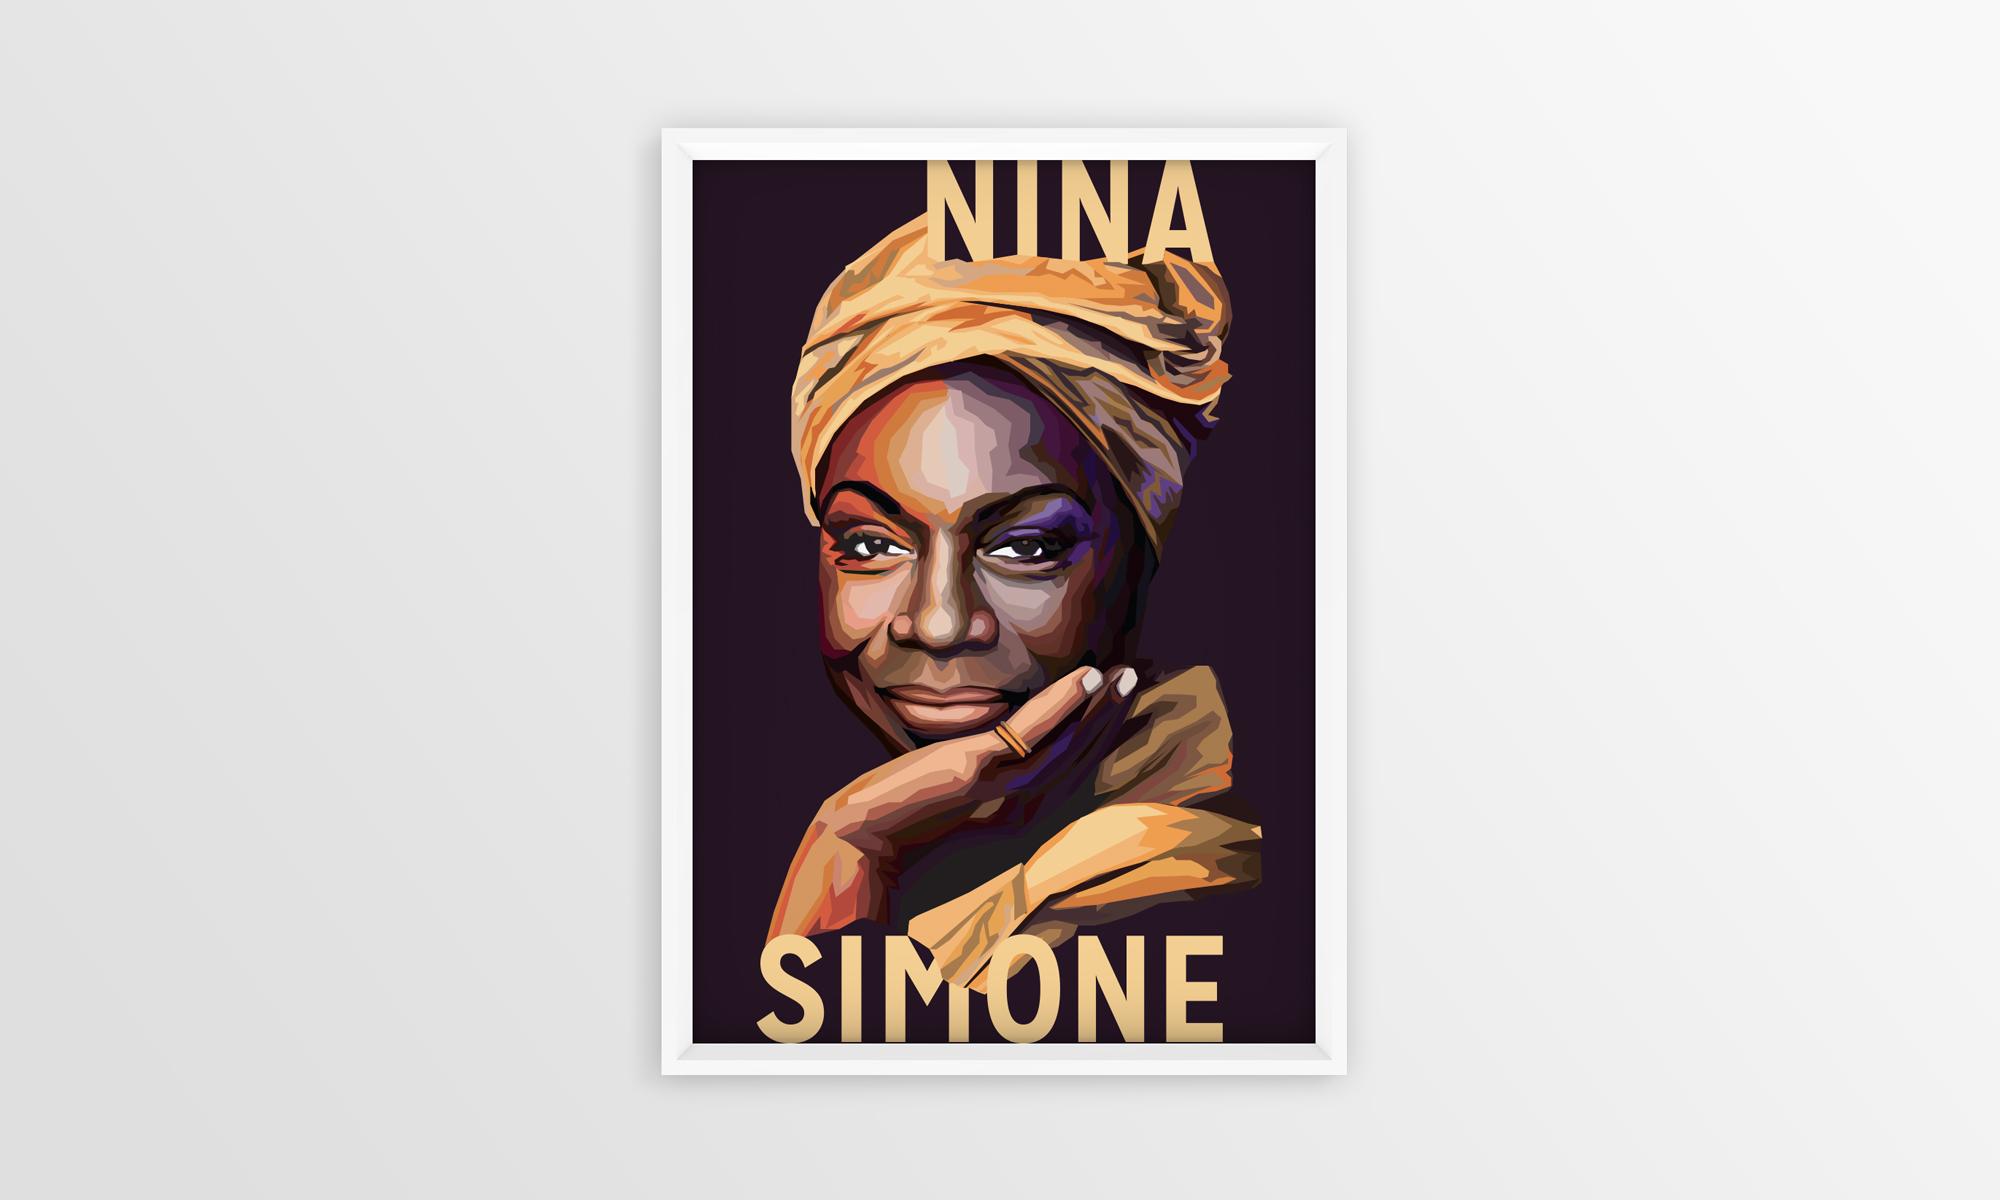 poster_ninasimone